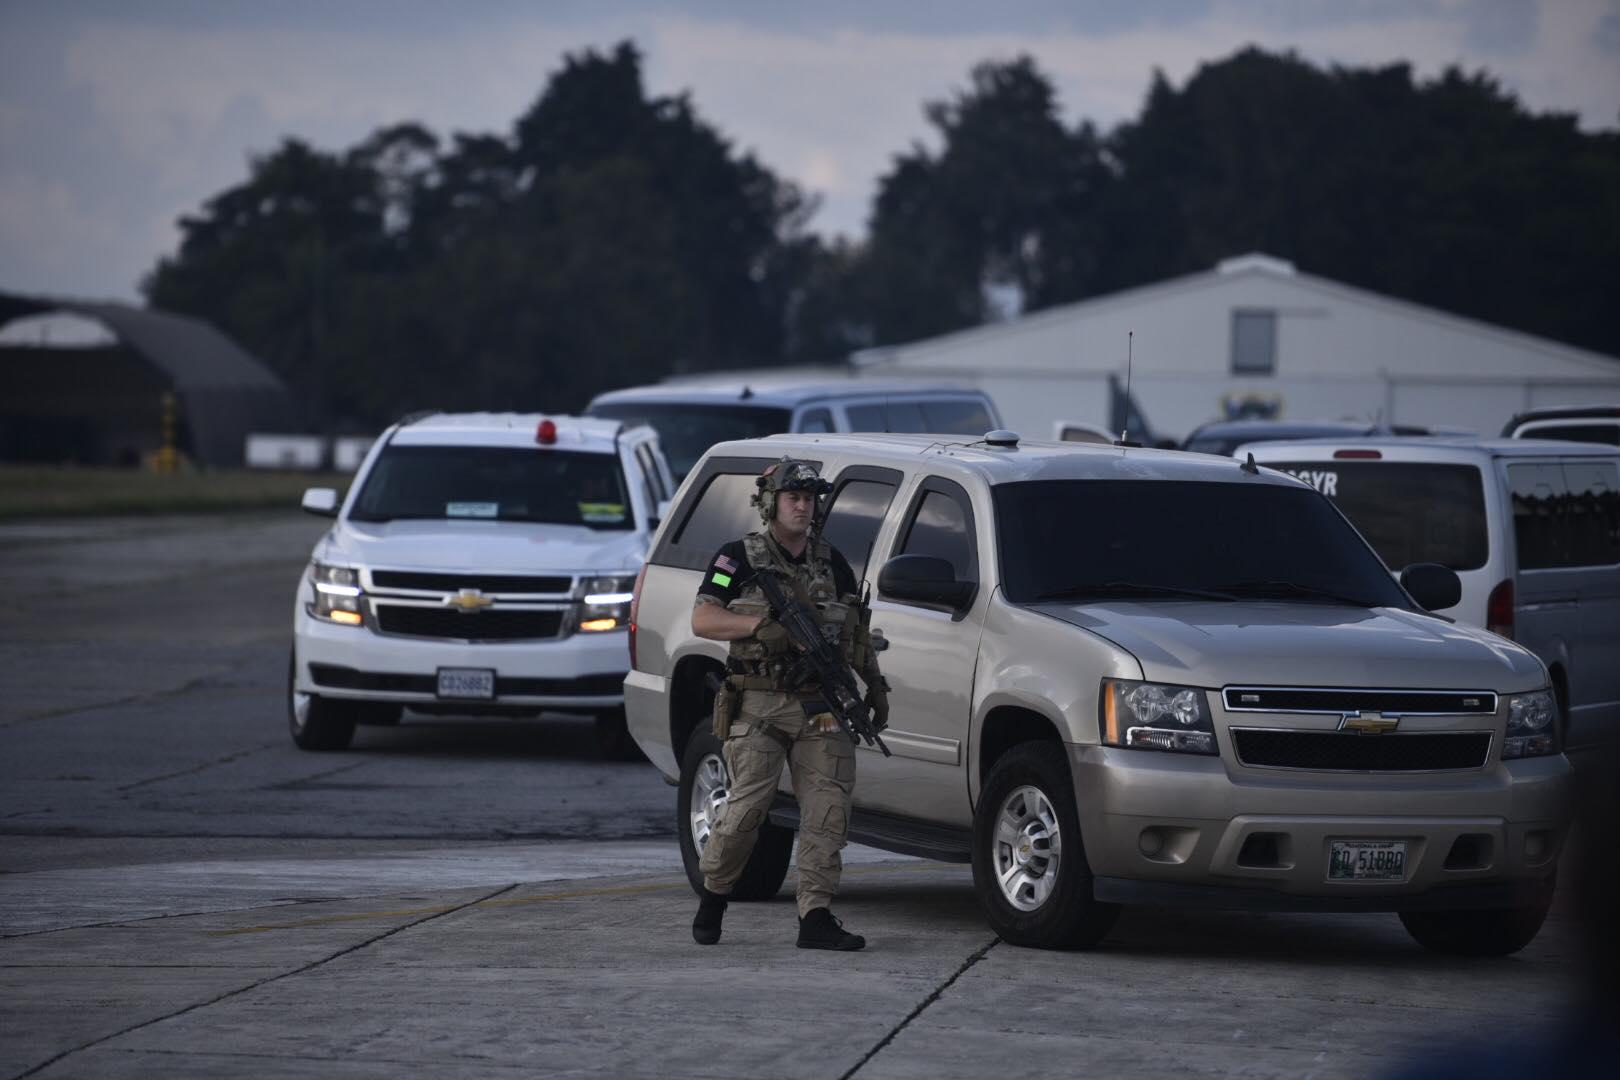 Agente de seguridad con fusil de asalto